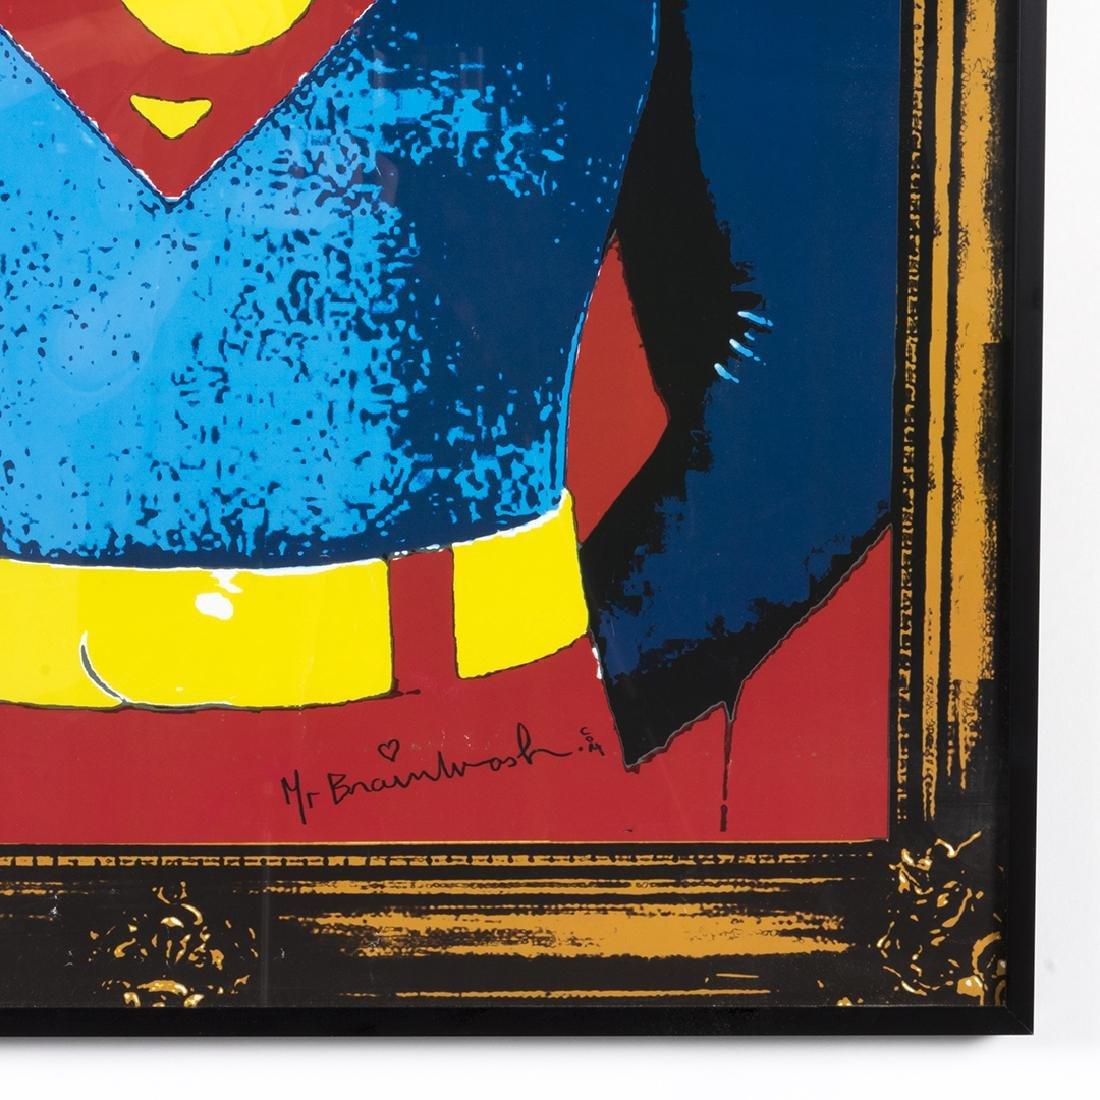 Mr. Brainwash Superman Silkscreen - 2